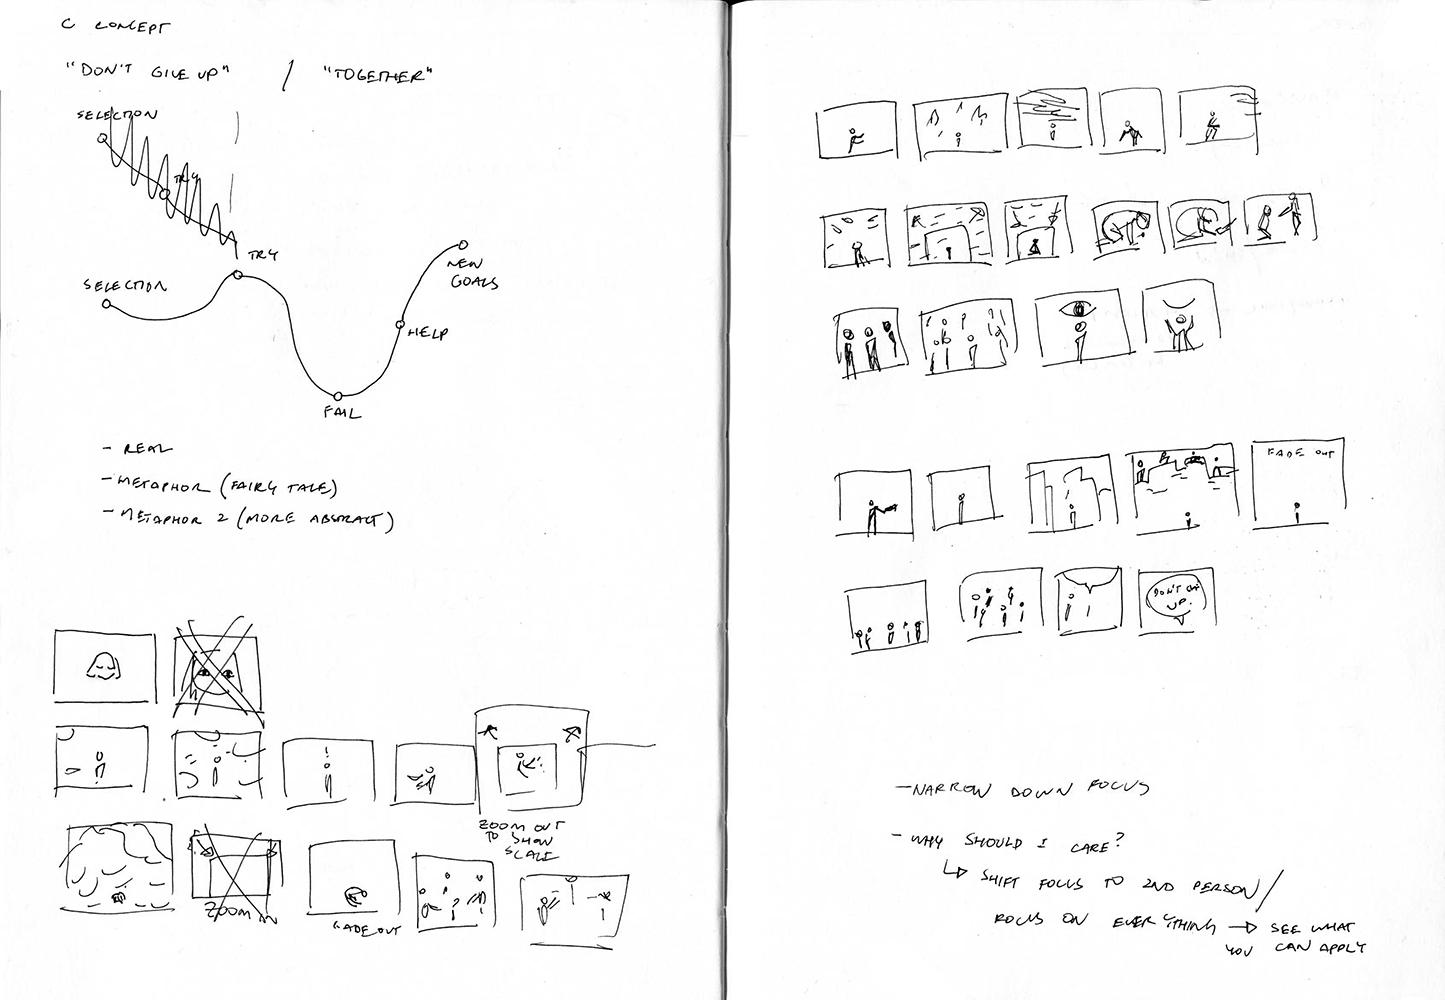 brainstorming concepts